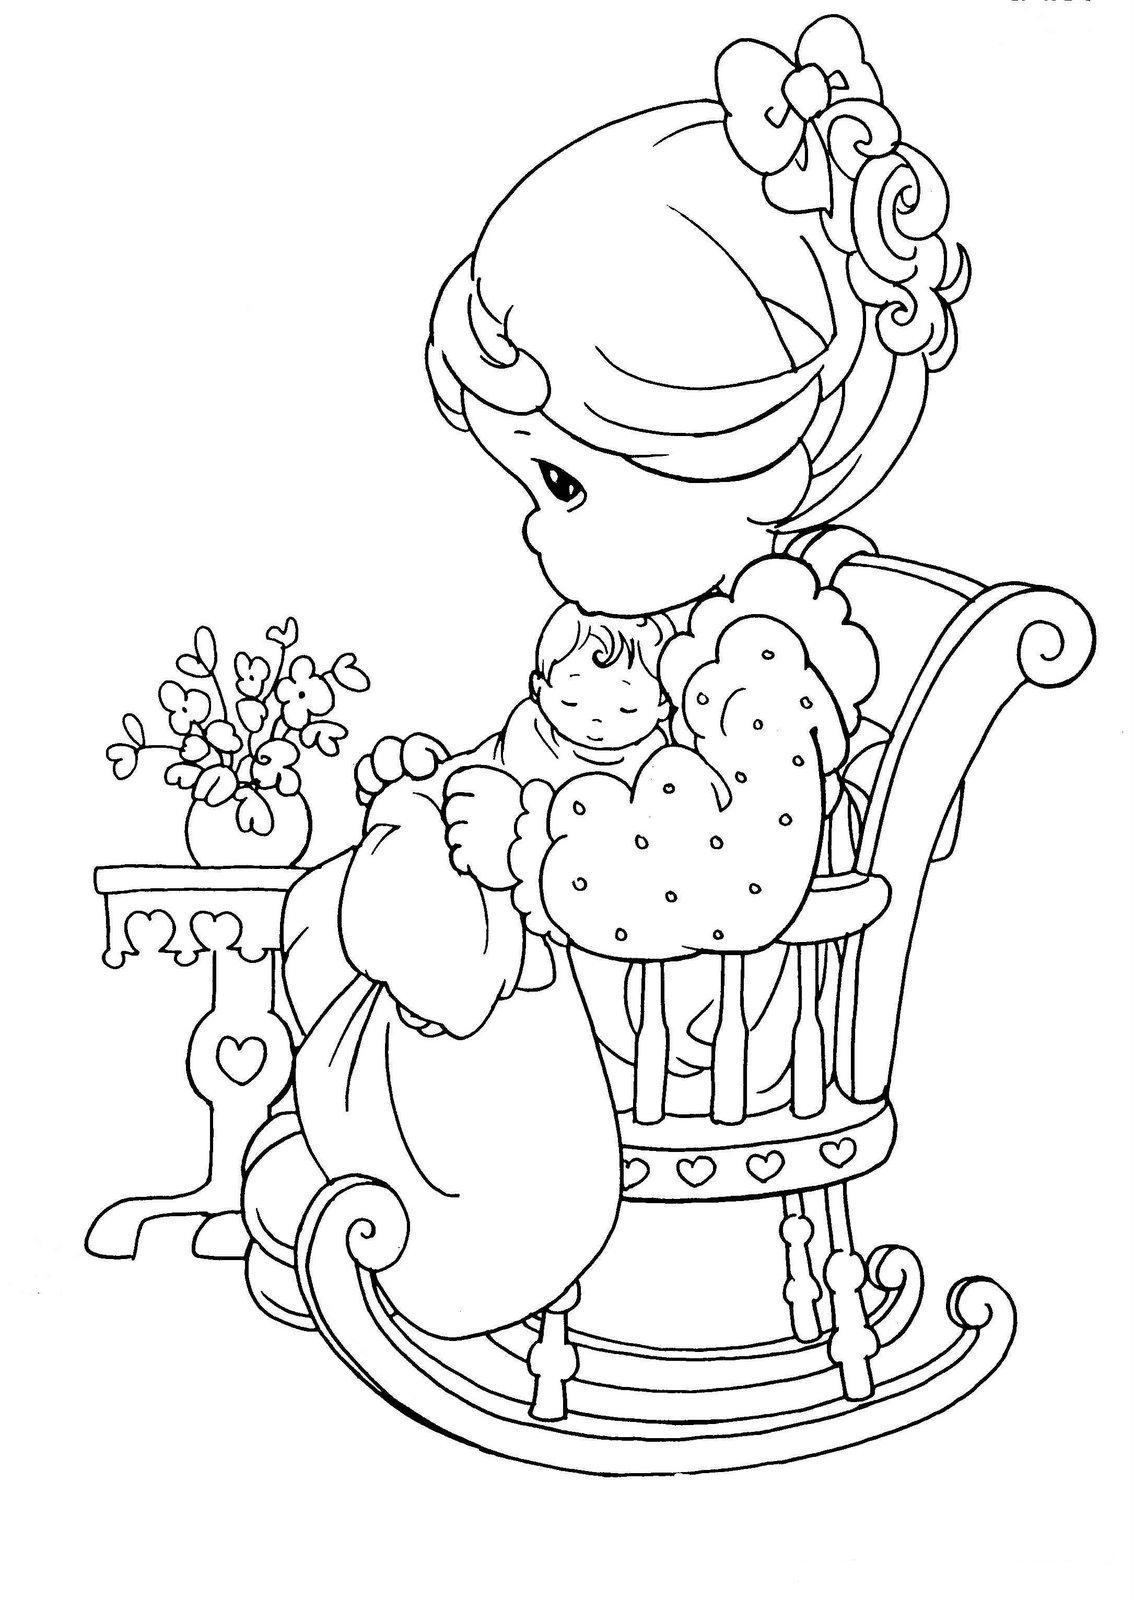 Preciosos Momentos: Dia de la Madre ~ Dibujos para Colorear Infantil